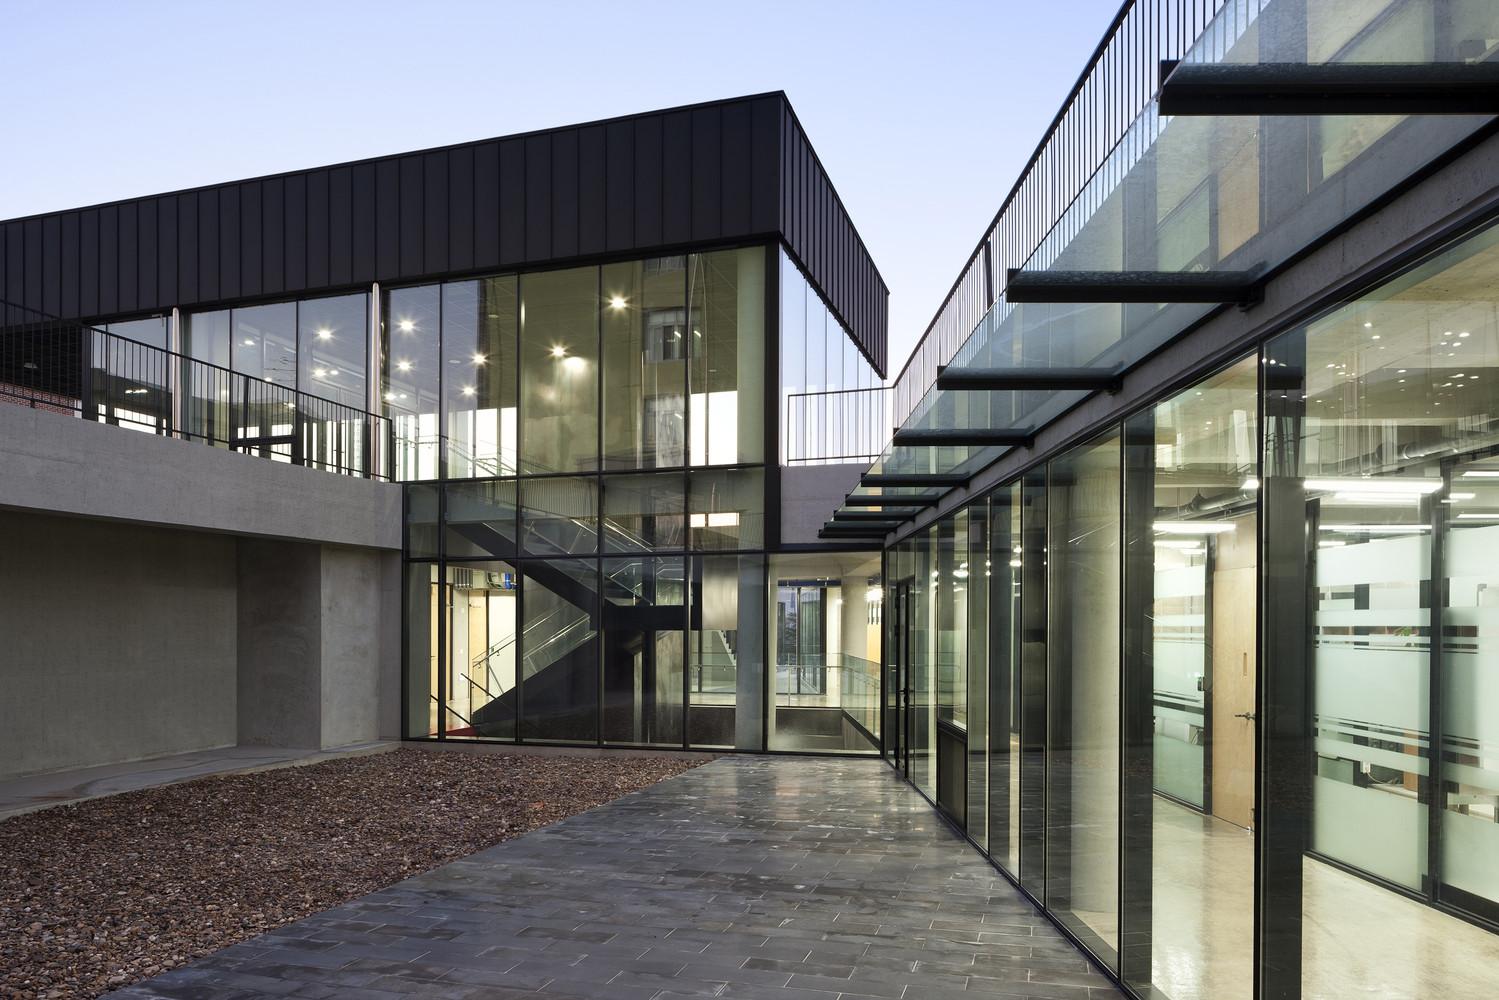 architectural design studio address. Architectural Design Studio of KNU  Park Young Che Gallery ADF Architects 2